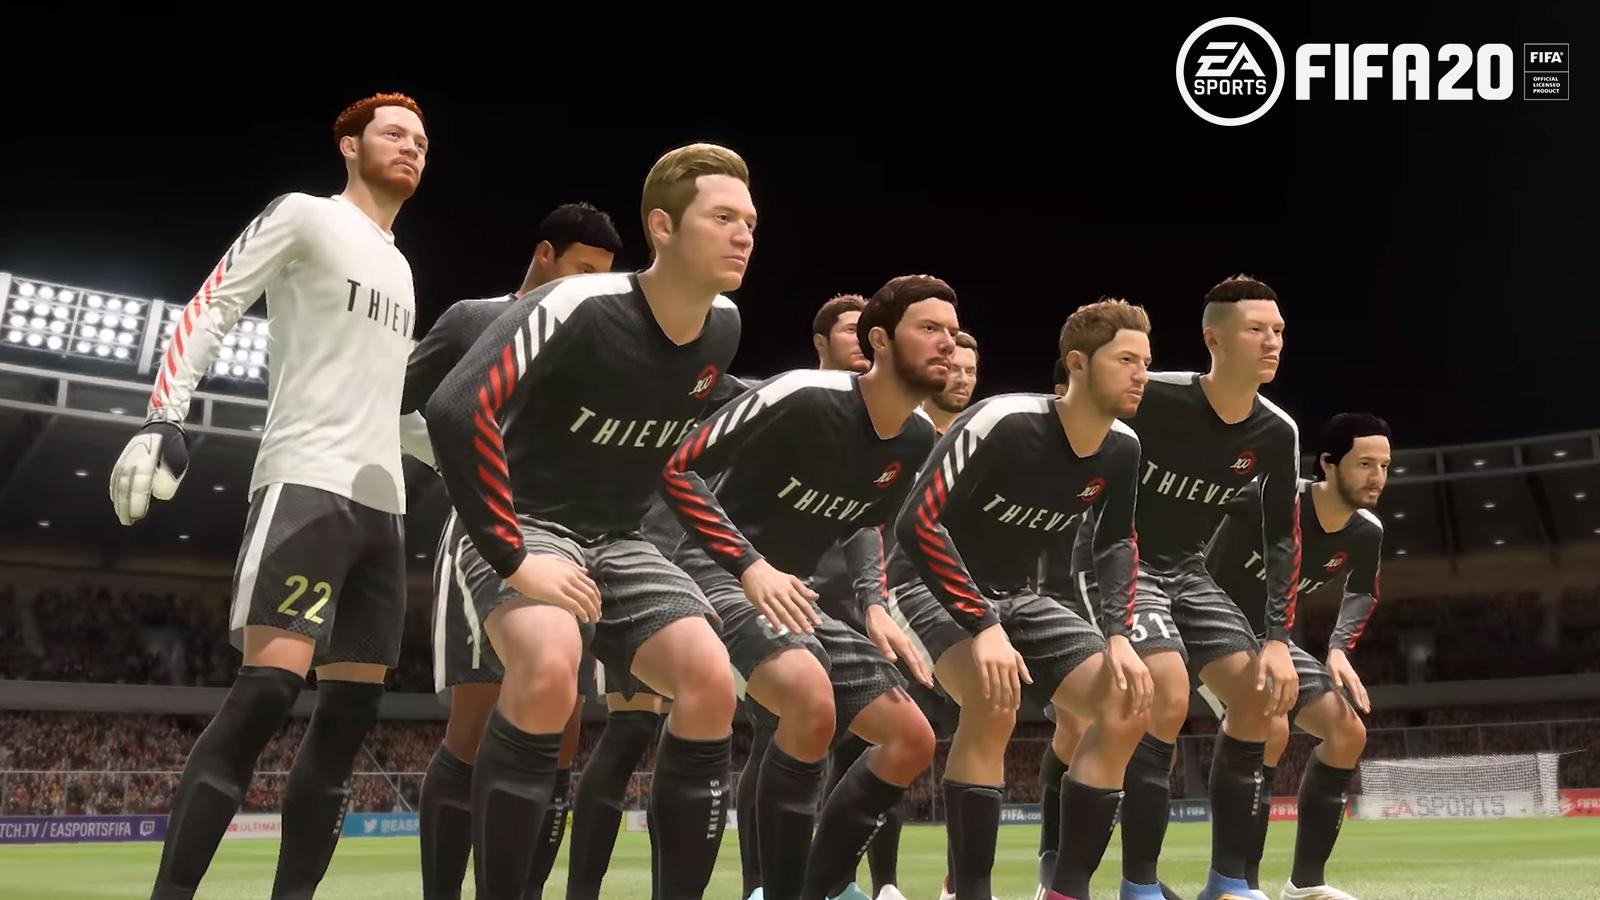 EA SPORTS / 100 THIEVES